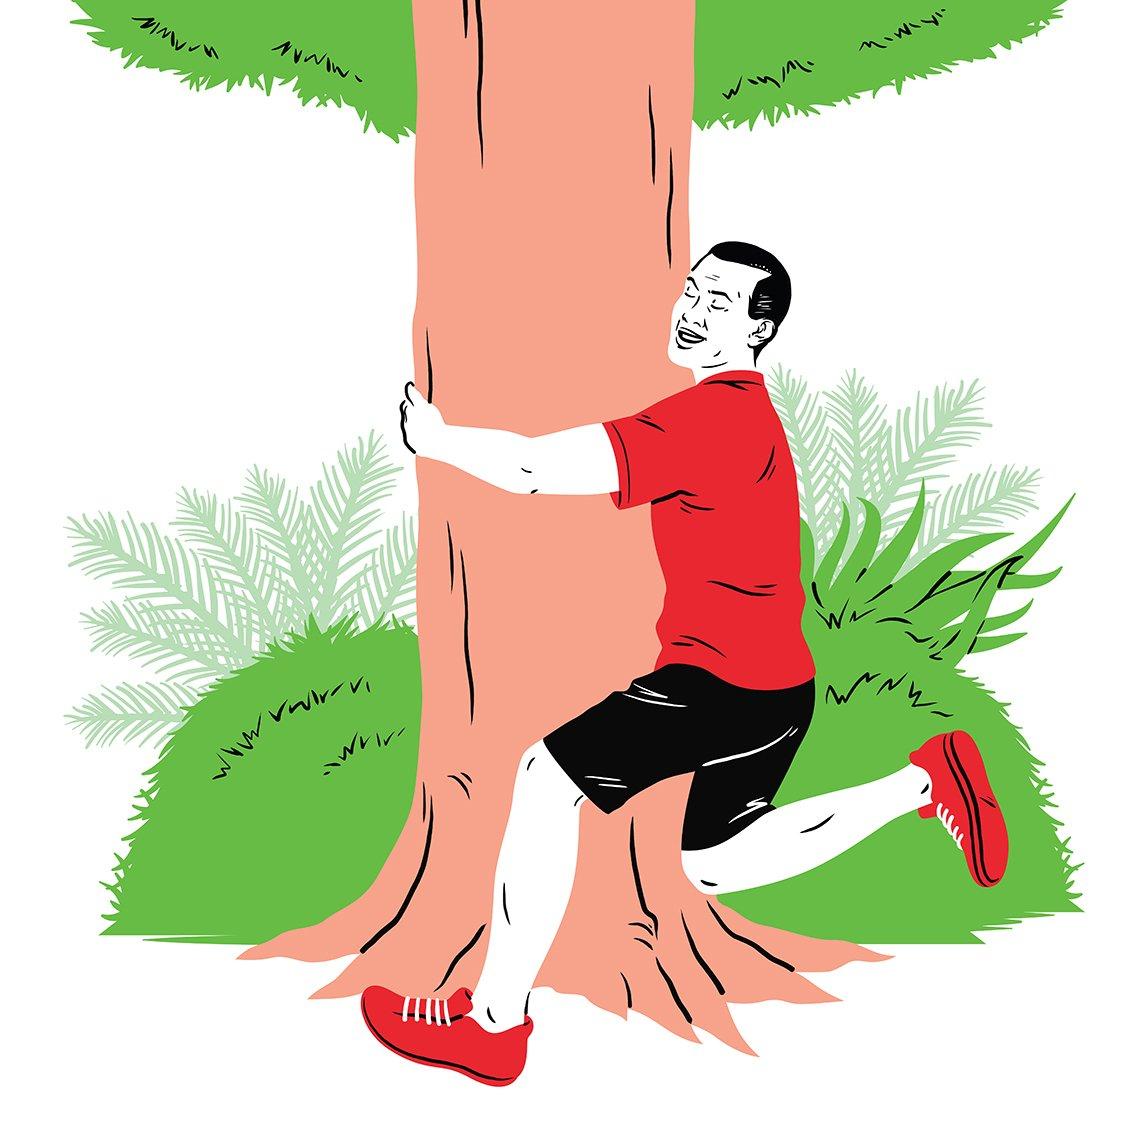 Tree huggers walk